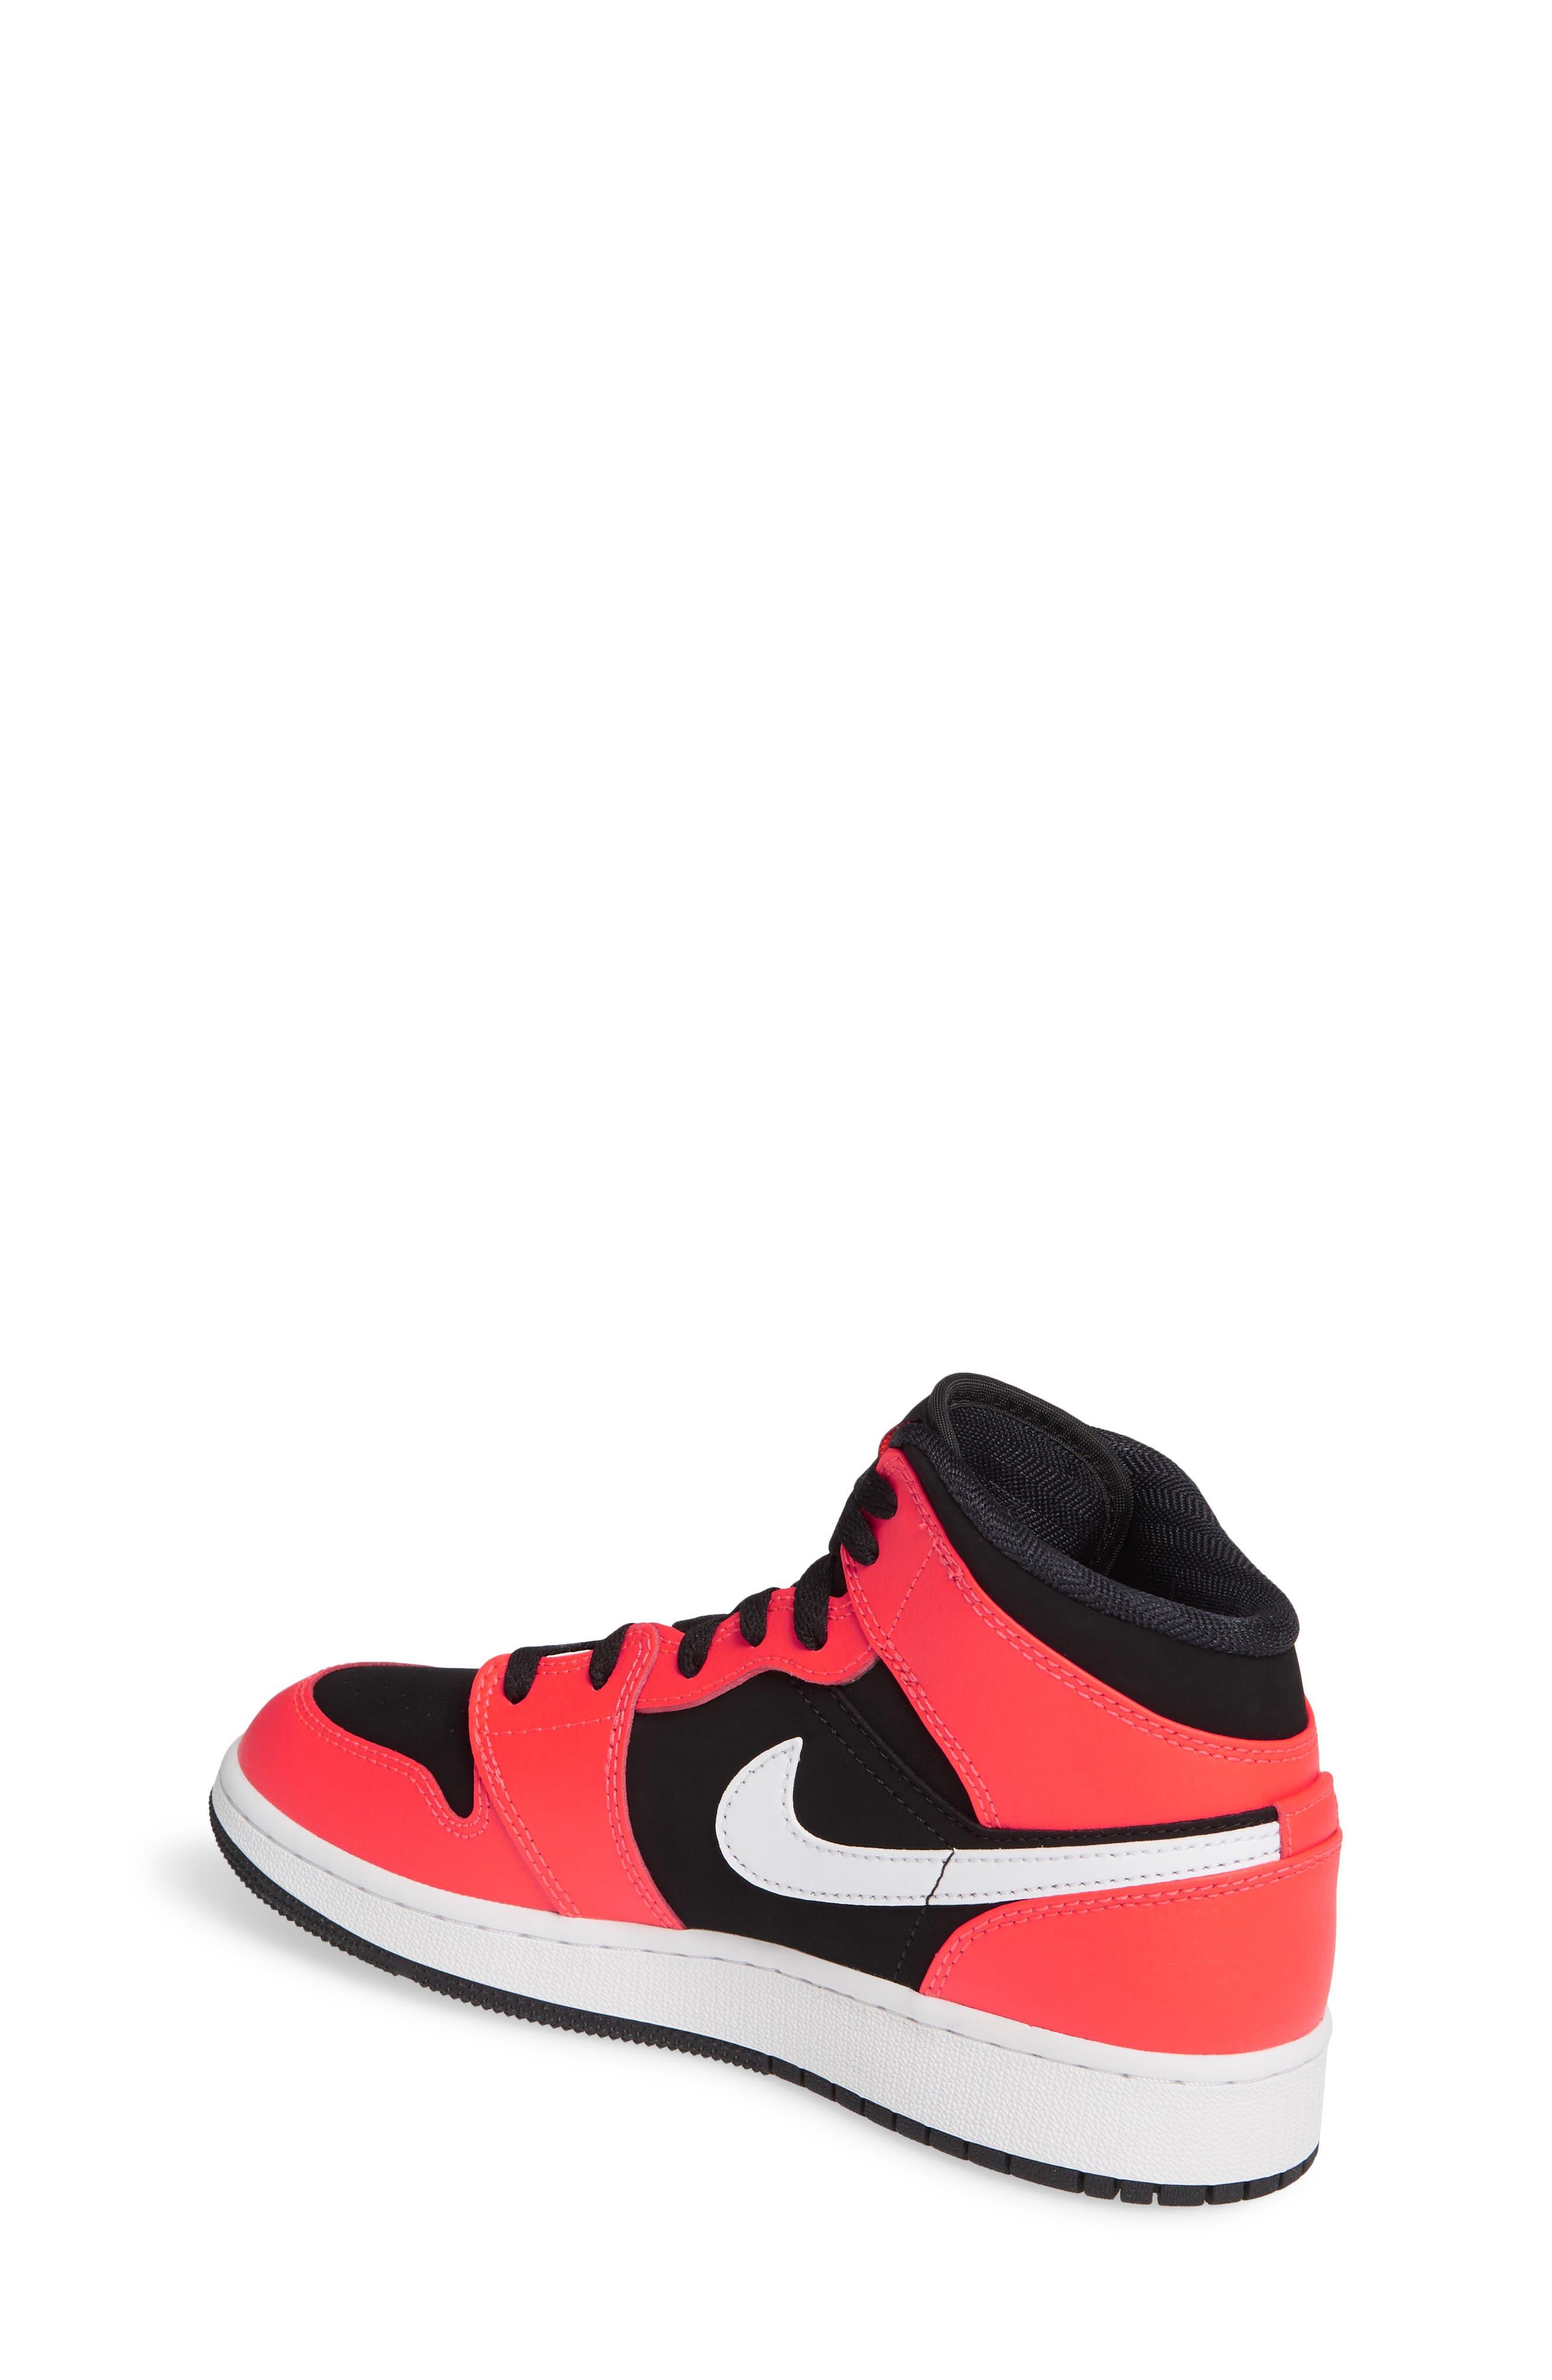 JORDAN, Nike 'Air Jordan 1 Mid' Sneaker, Alternate thumbnail 2, color, BLACK/ INFRARED 23-WHITE